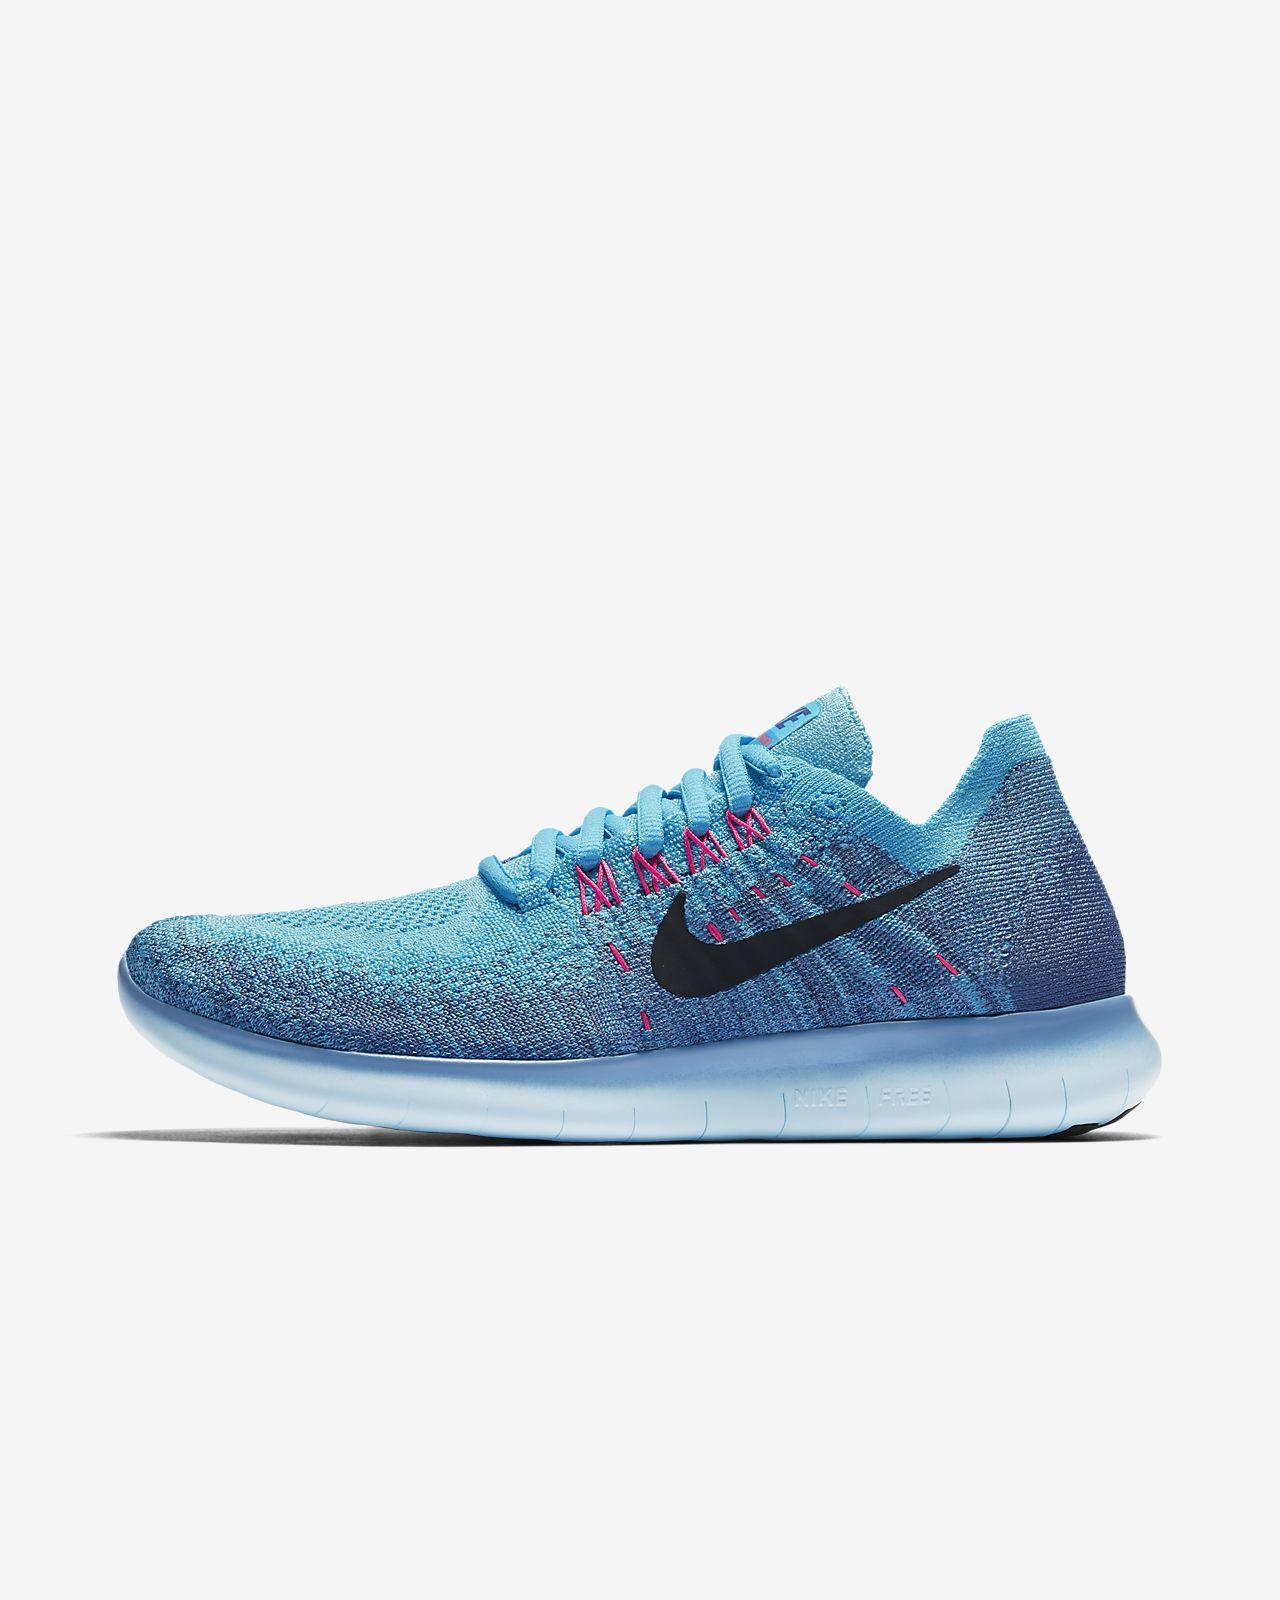 ... Chaussure de running Nike Free RN Flyknit 2017 pour Femme